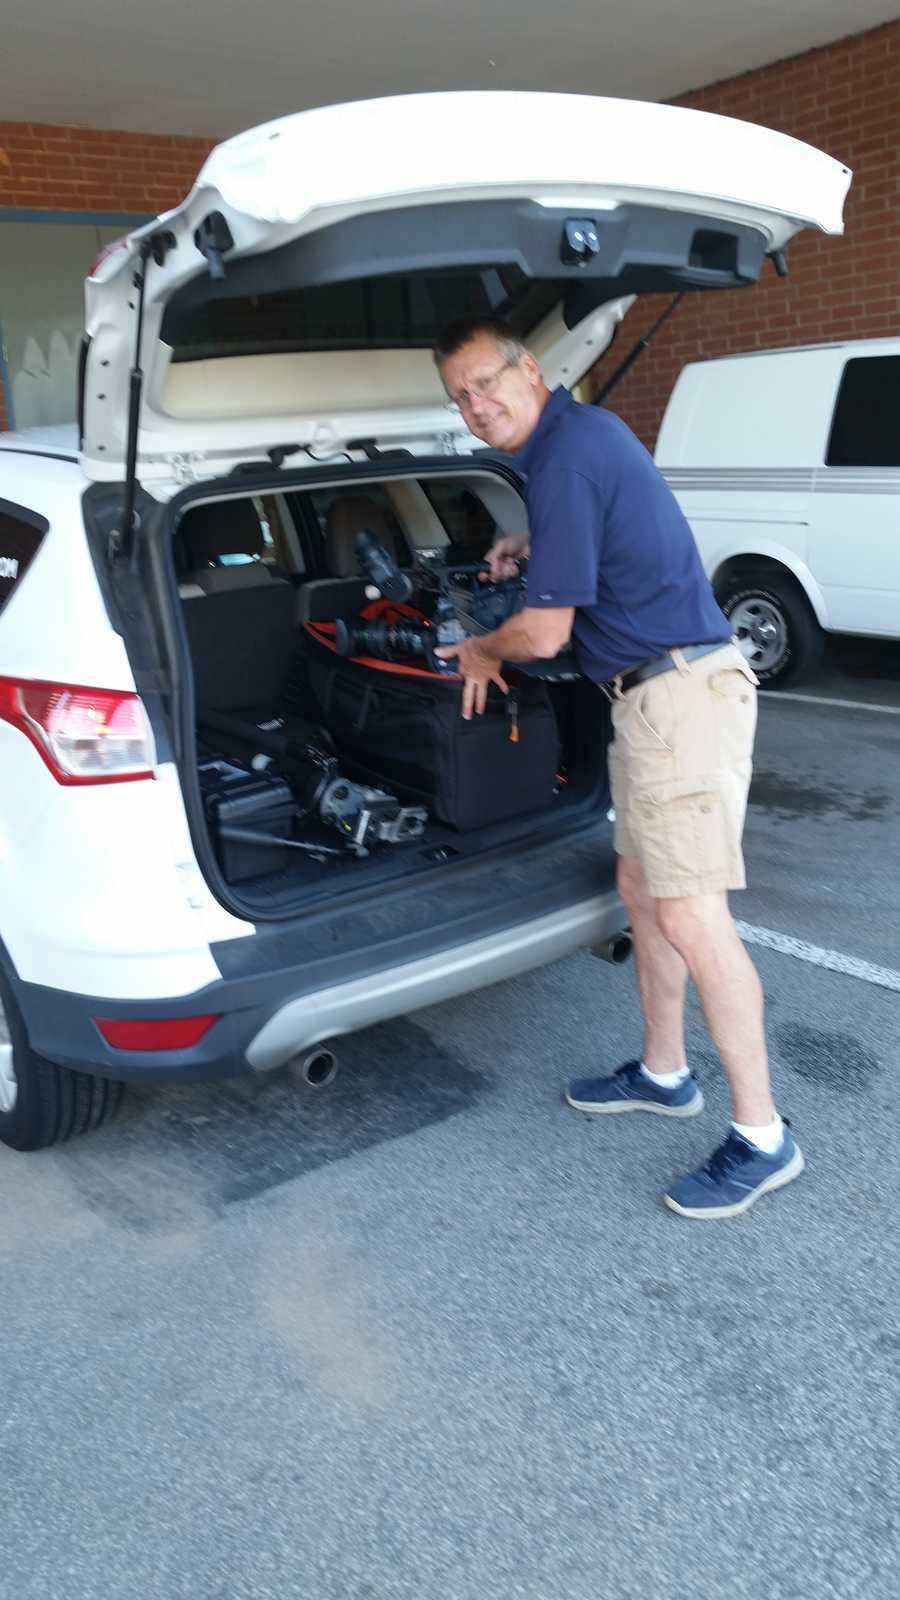 WYFF News 4's John Lyon leaving Thursday to cover the Northwood team in Pennsylvania.